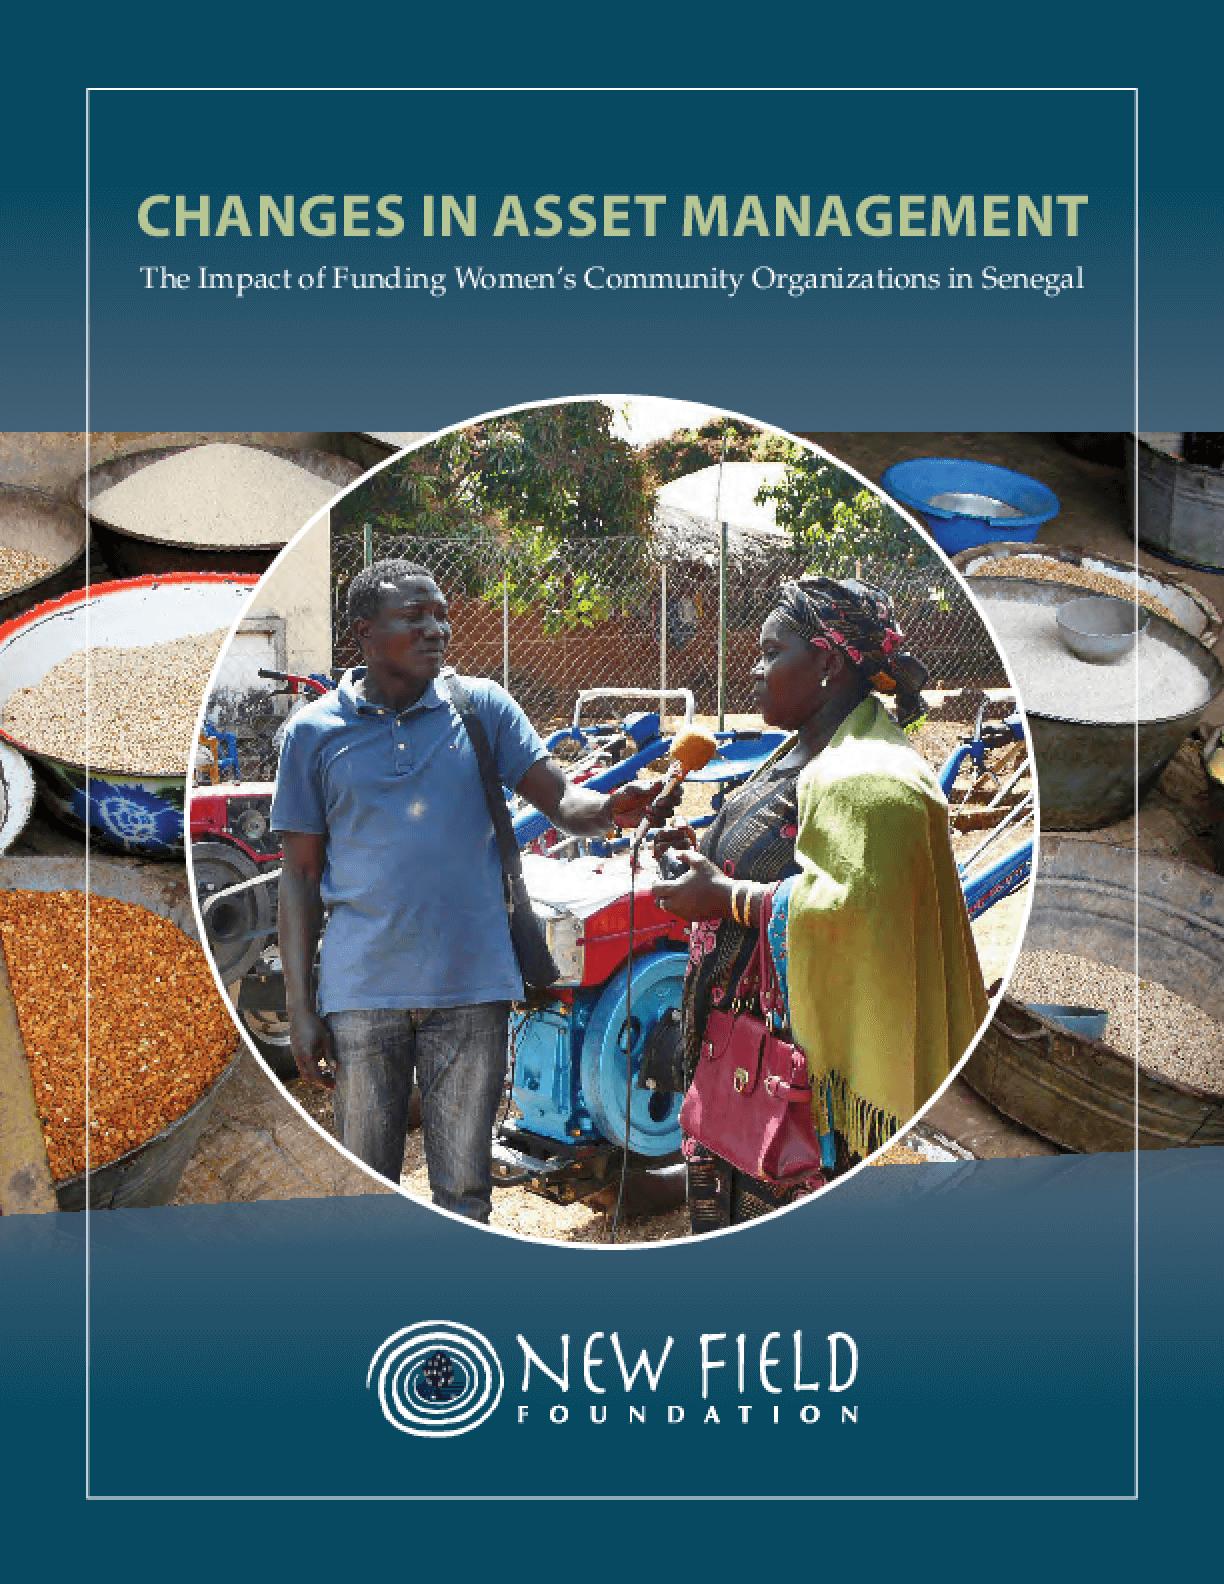 Changes in Asset Management